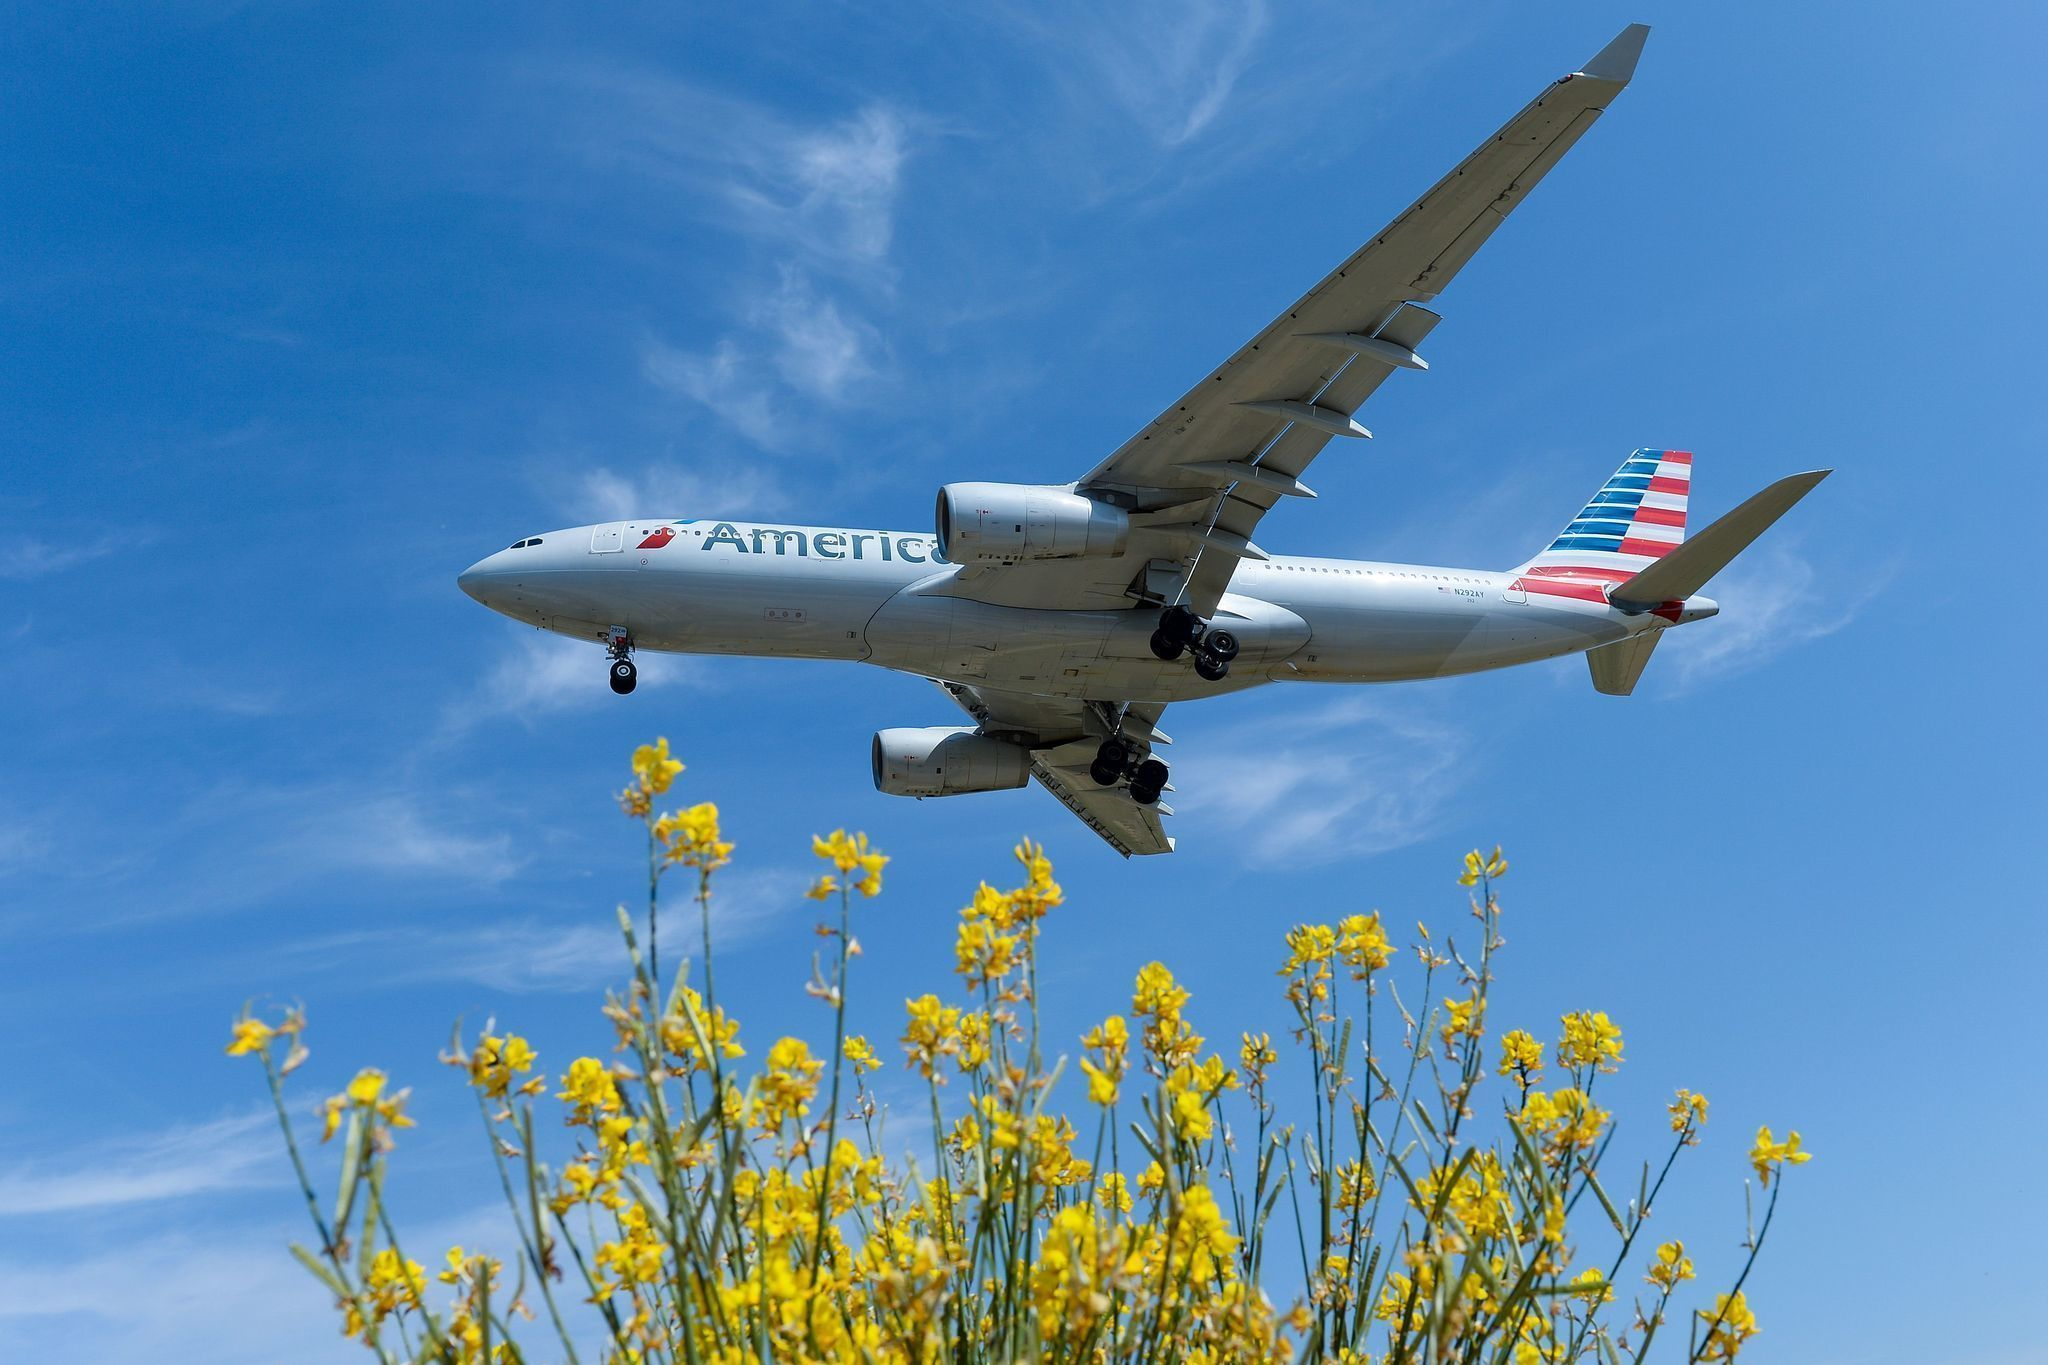 american mimics united with fare barring use of overhead bin